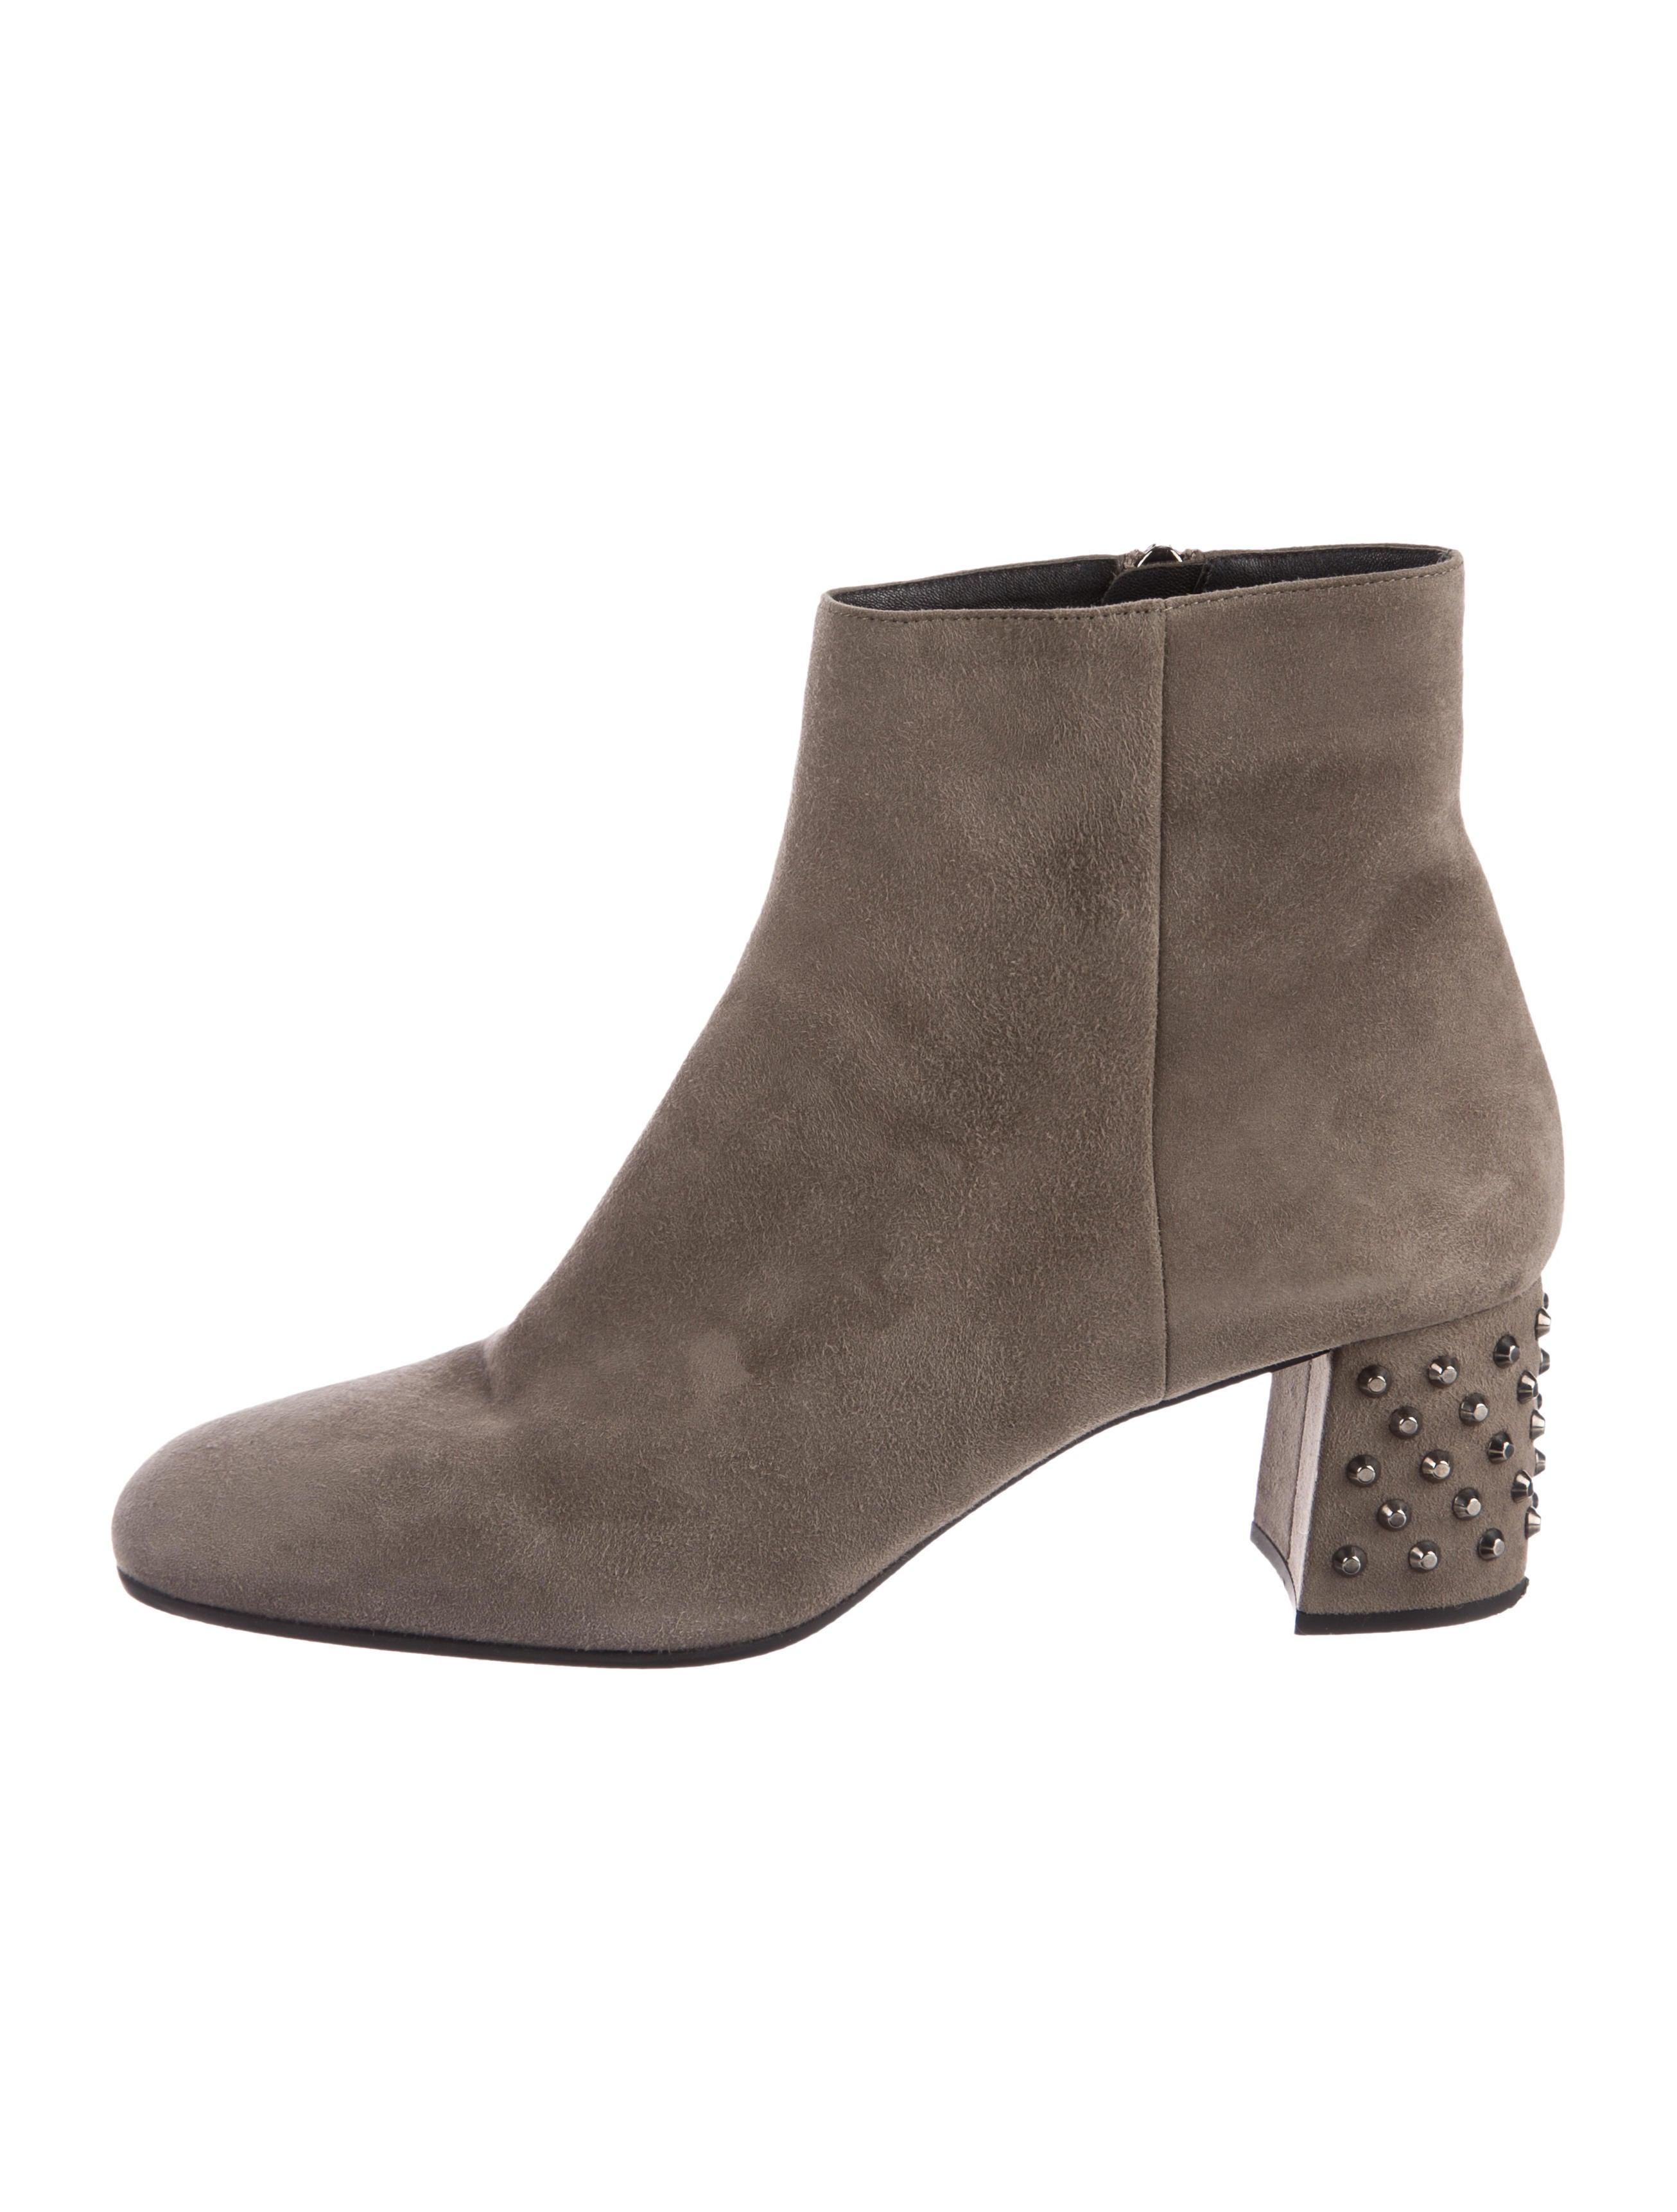 Prada Suede Studded Ankle Boots cheap sale hot sale shop cheap online FbxT3C